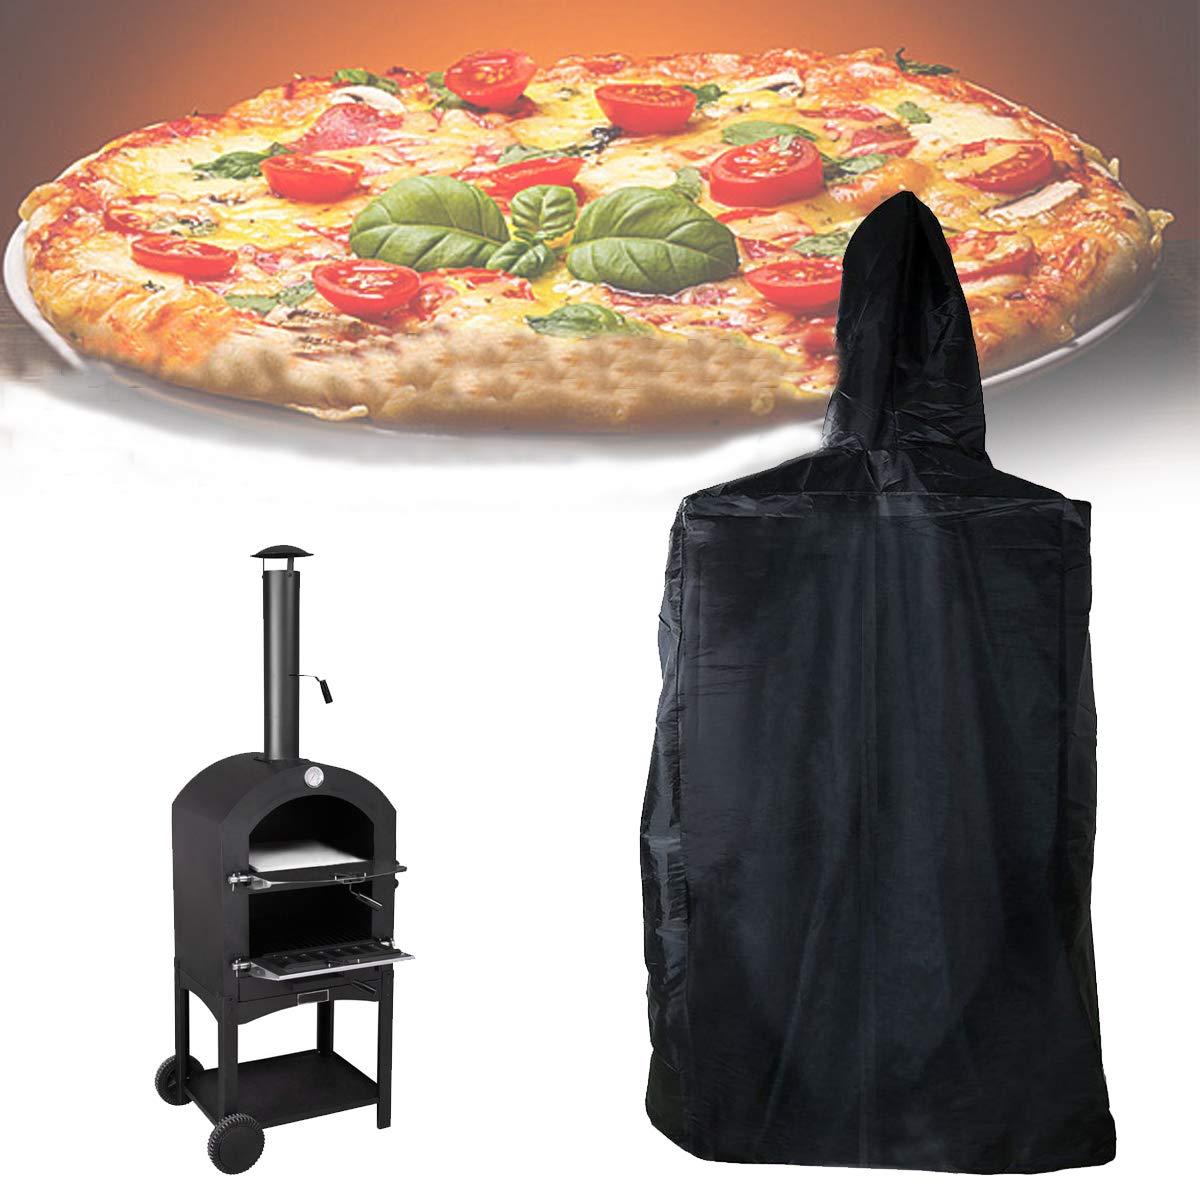 ESSORT Outdoor Pizza Oven with Waterproof Cover